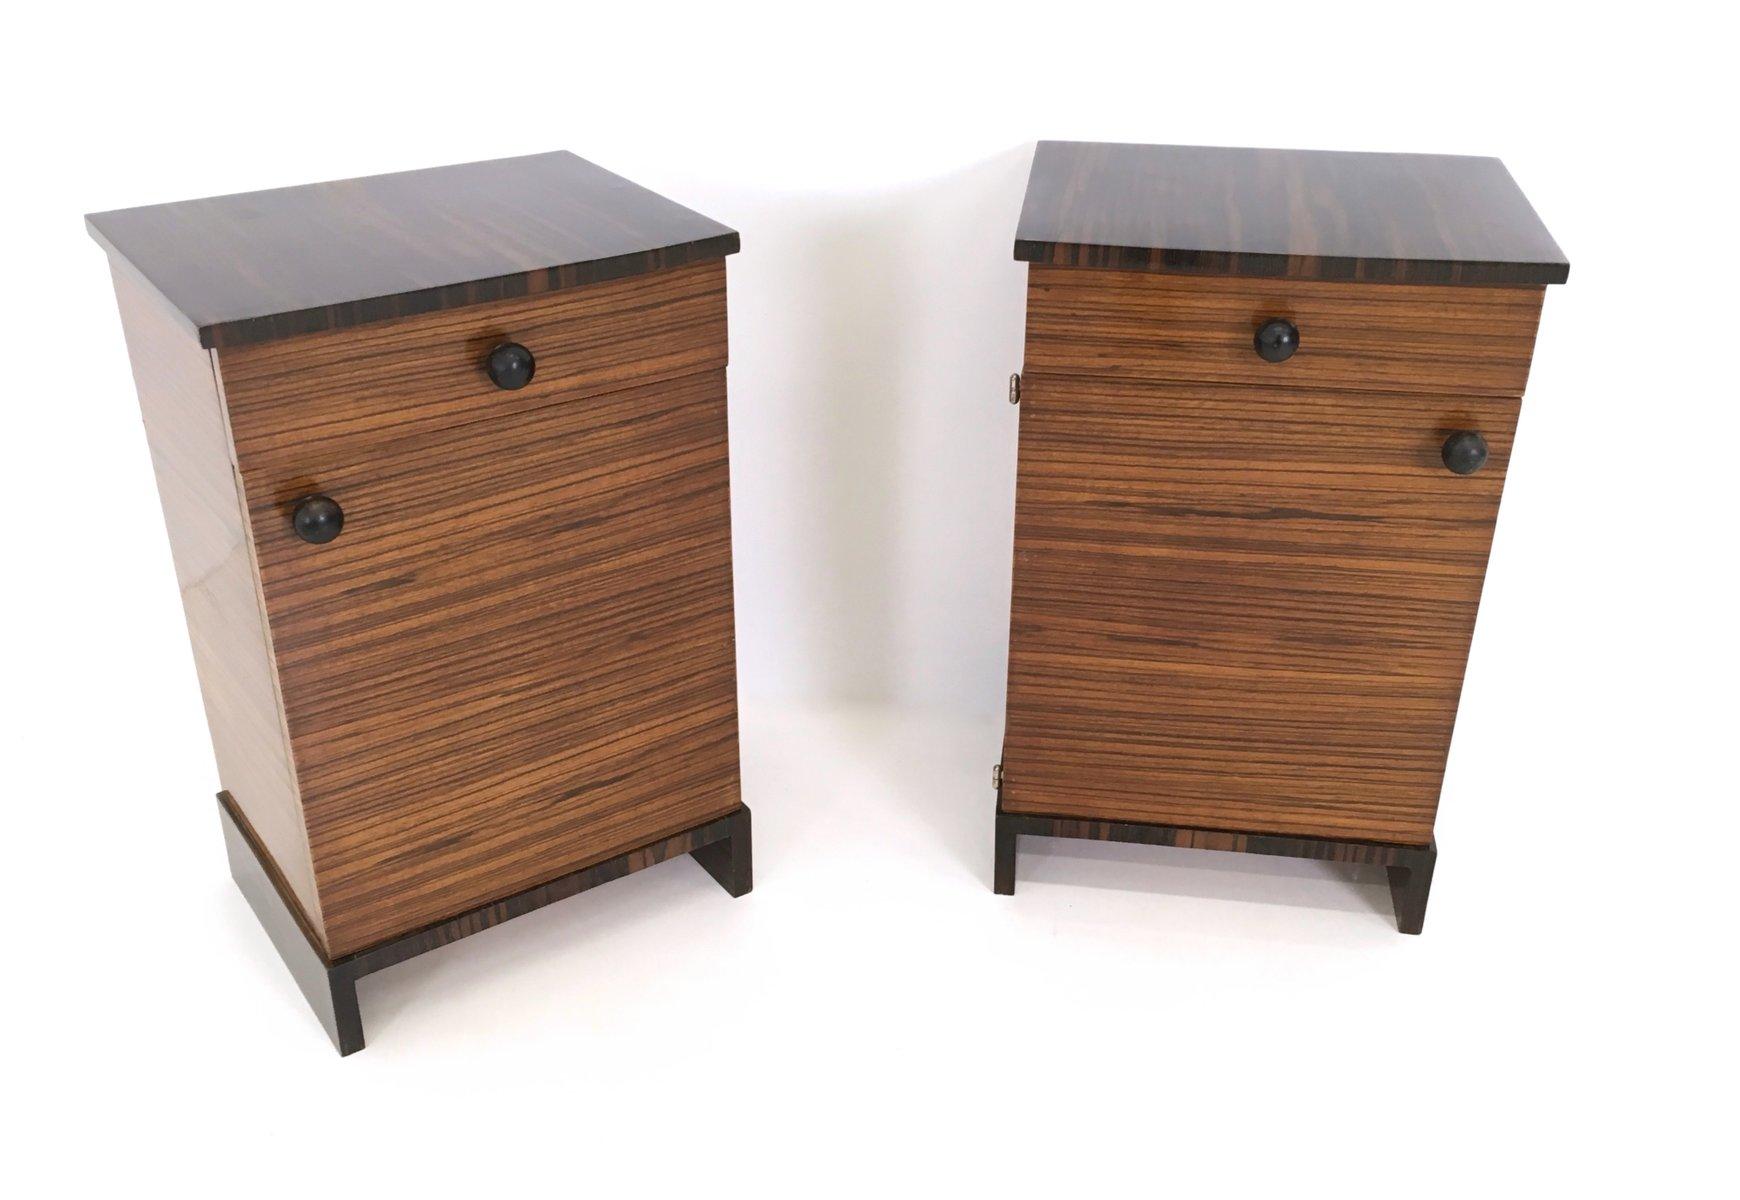 Zebrawood U0026 Macassar Ebony Bedside Tables, 1940s, Set Of 2